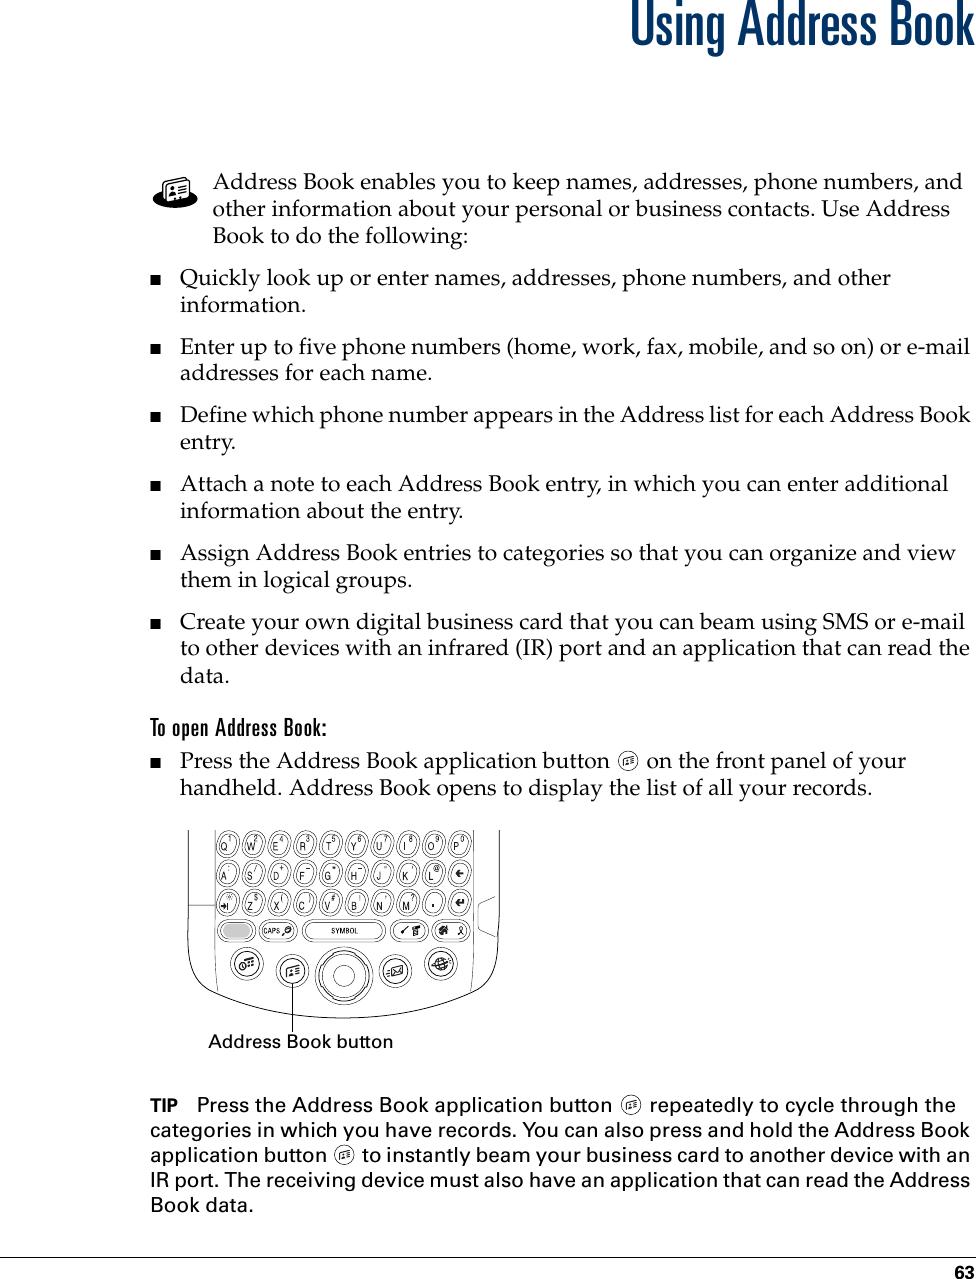 palm 710000 1900mhz gsm gprs pda communicator user manual 1 of 2